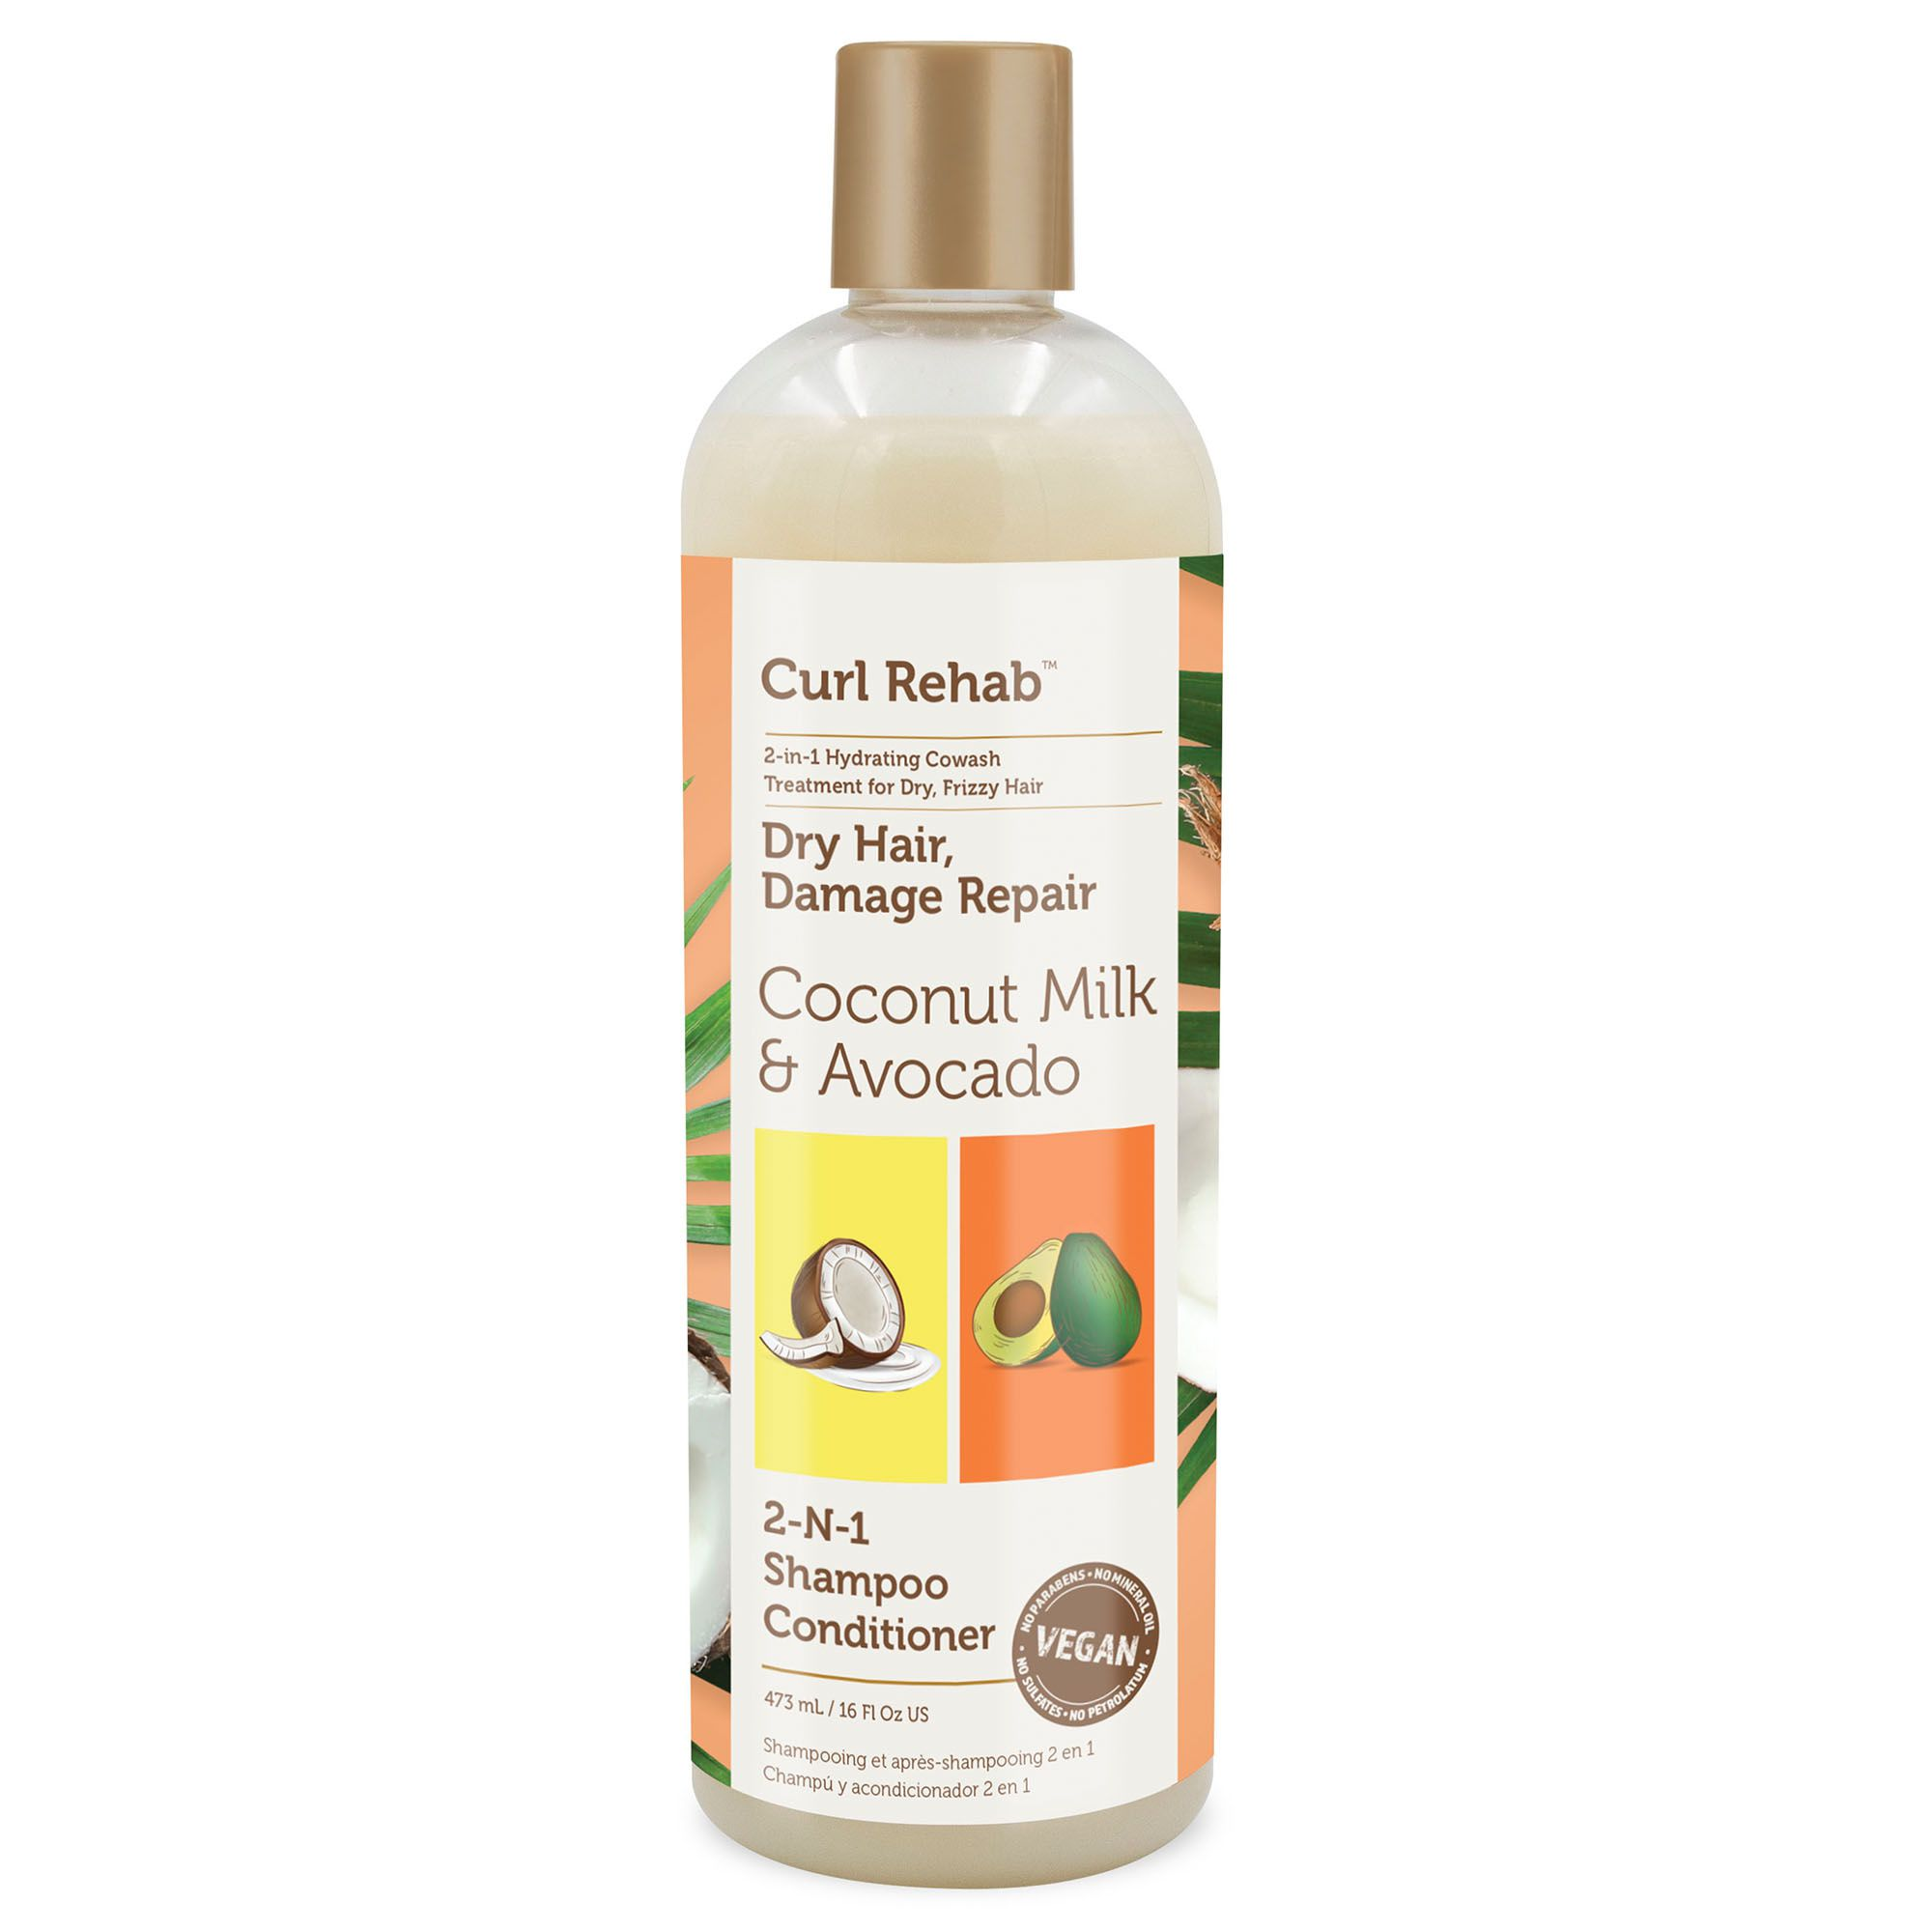 Coconut Milk & Avocado 2 in 1 Shampoo